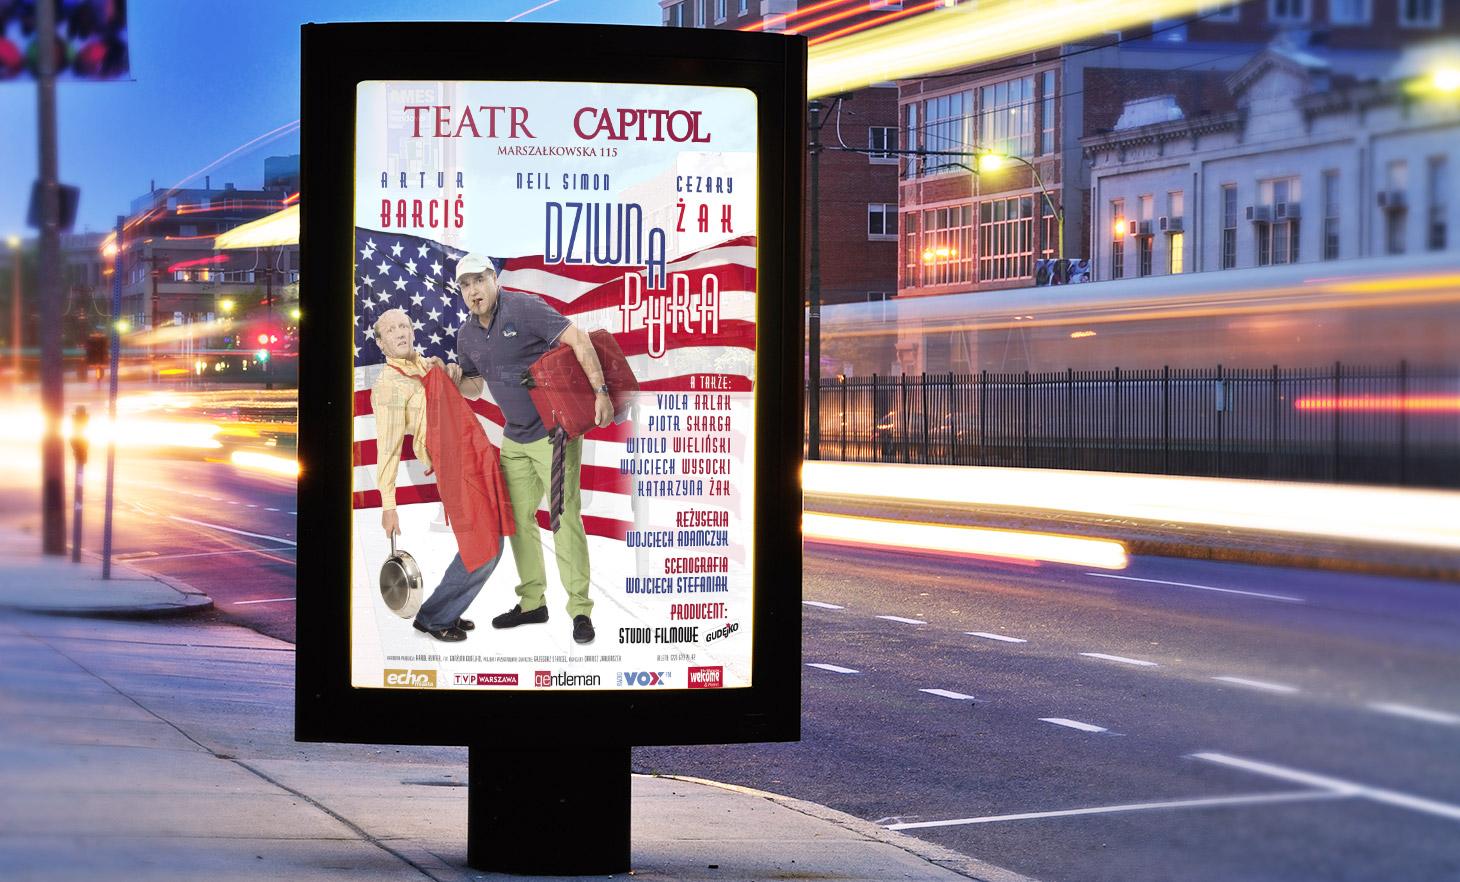 plakat dziwna para, Teatr Capitol, fot. Grażyna Gudejko